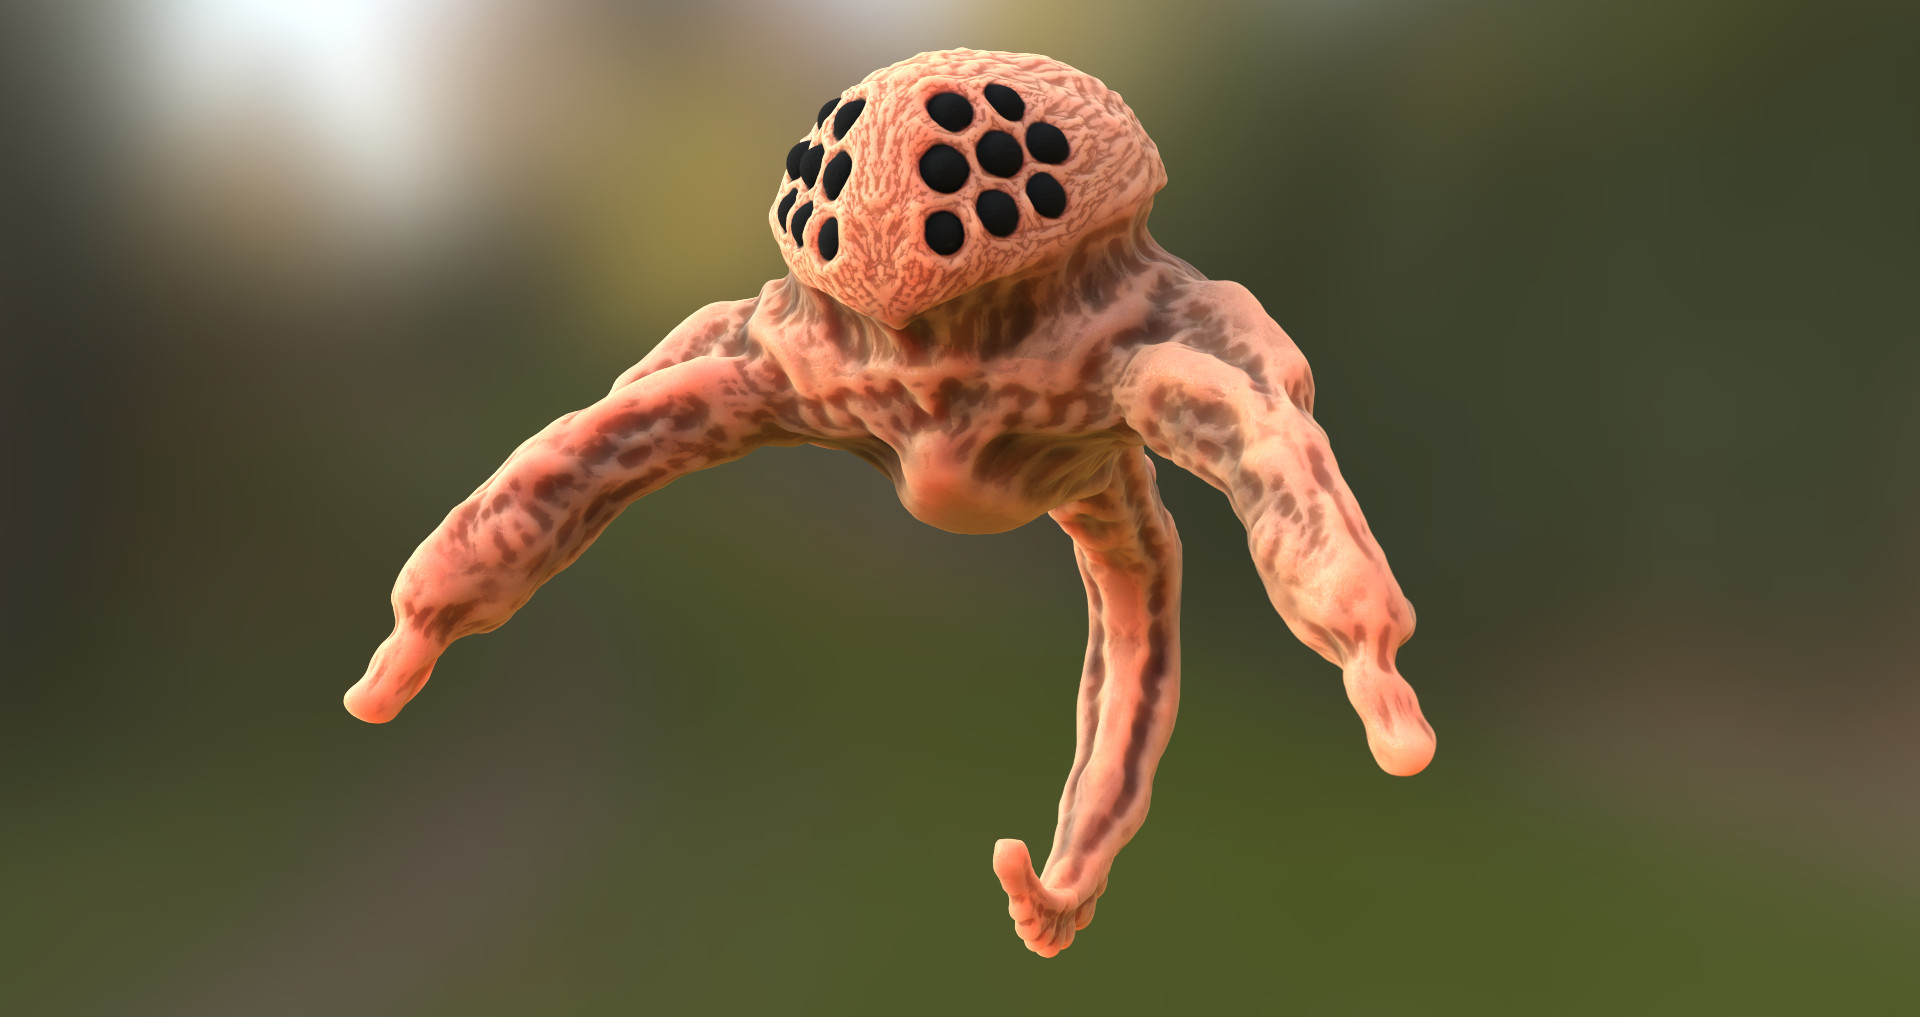 Tailed Alien Creature